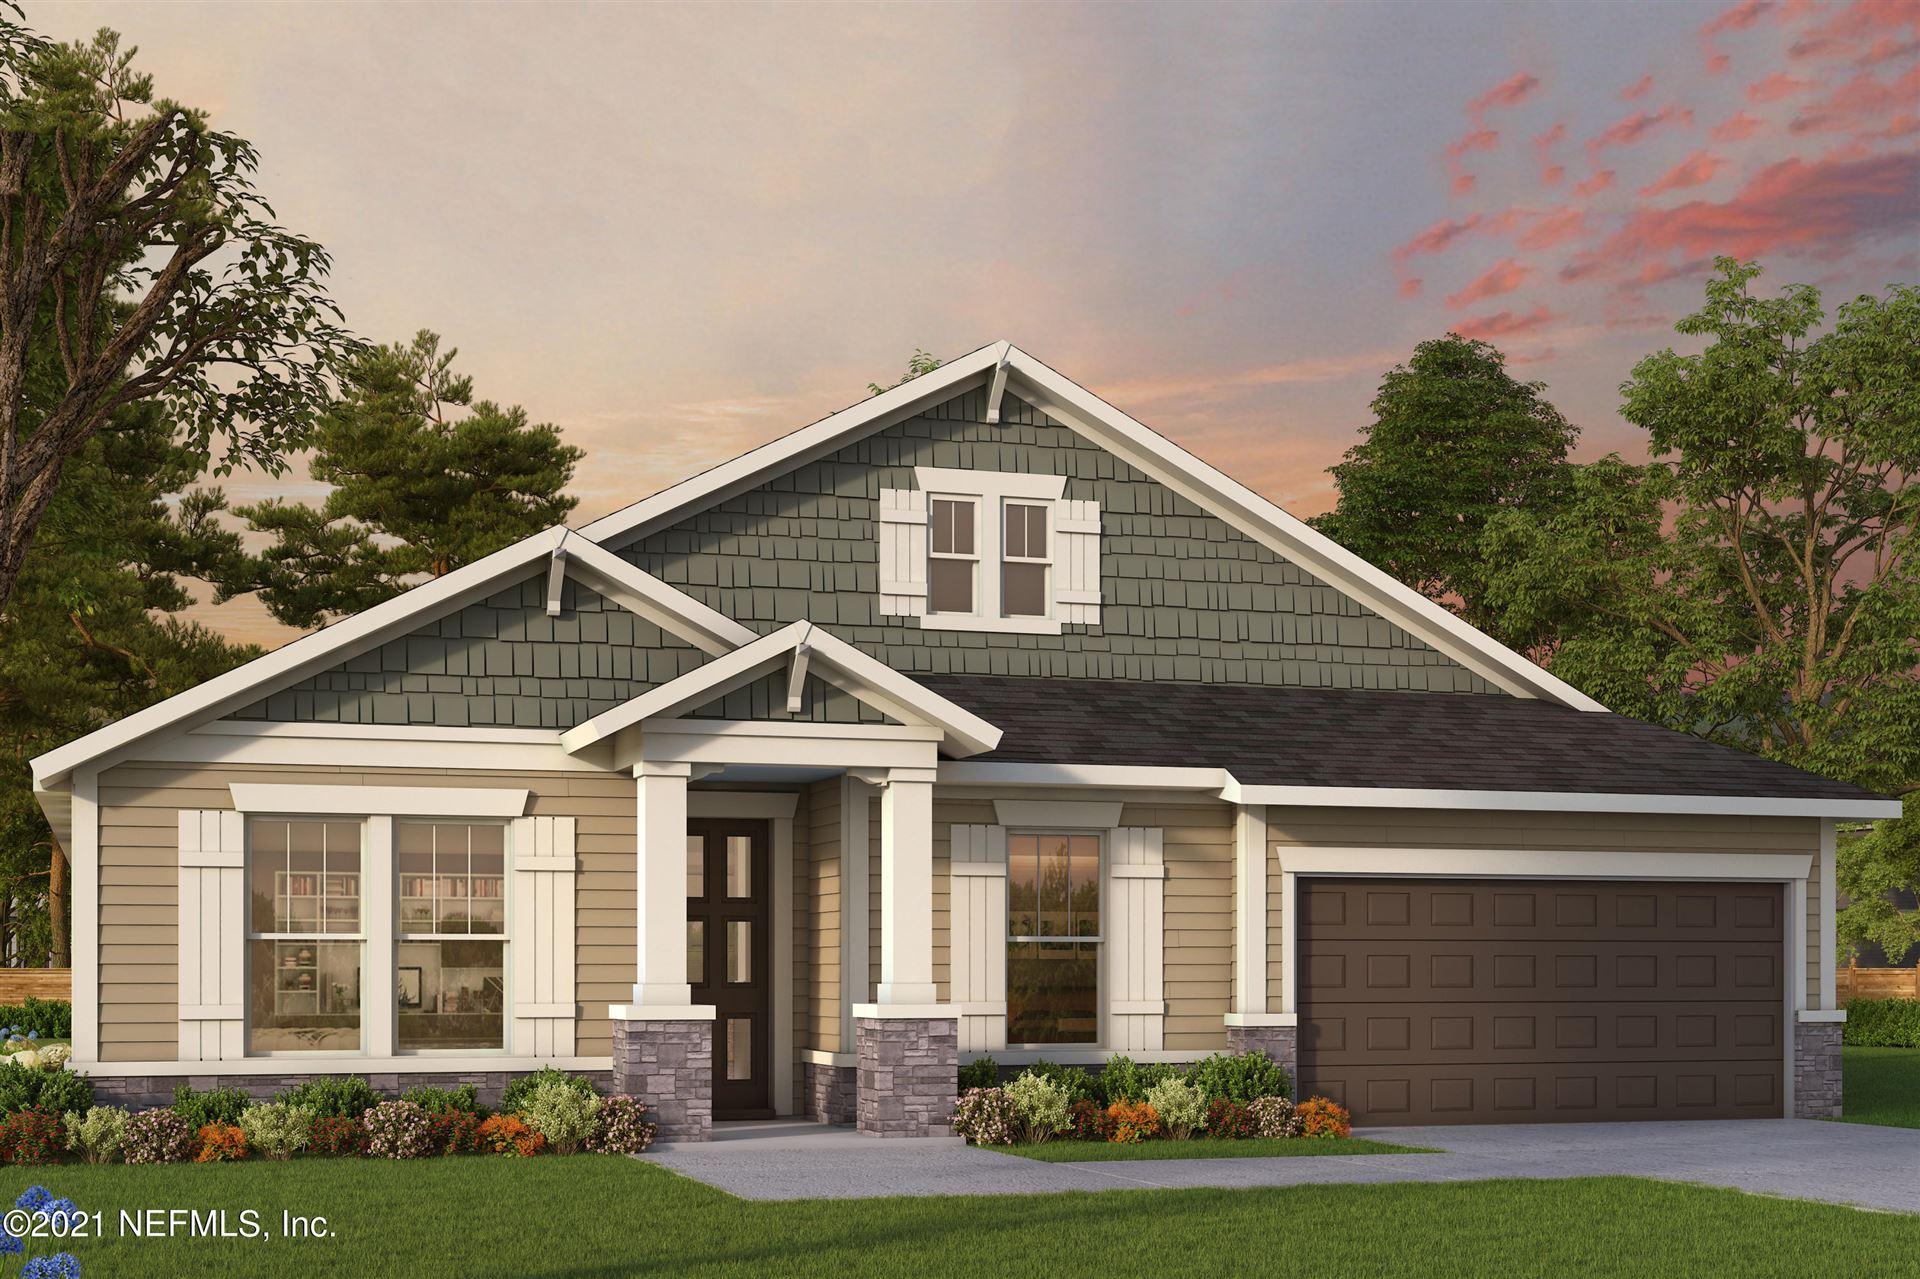 285 BOWERY AVE #Lot No: 89, Saint Augustine, FL 32092 - MLS#: 1094304